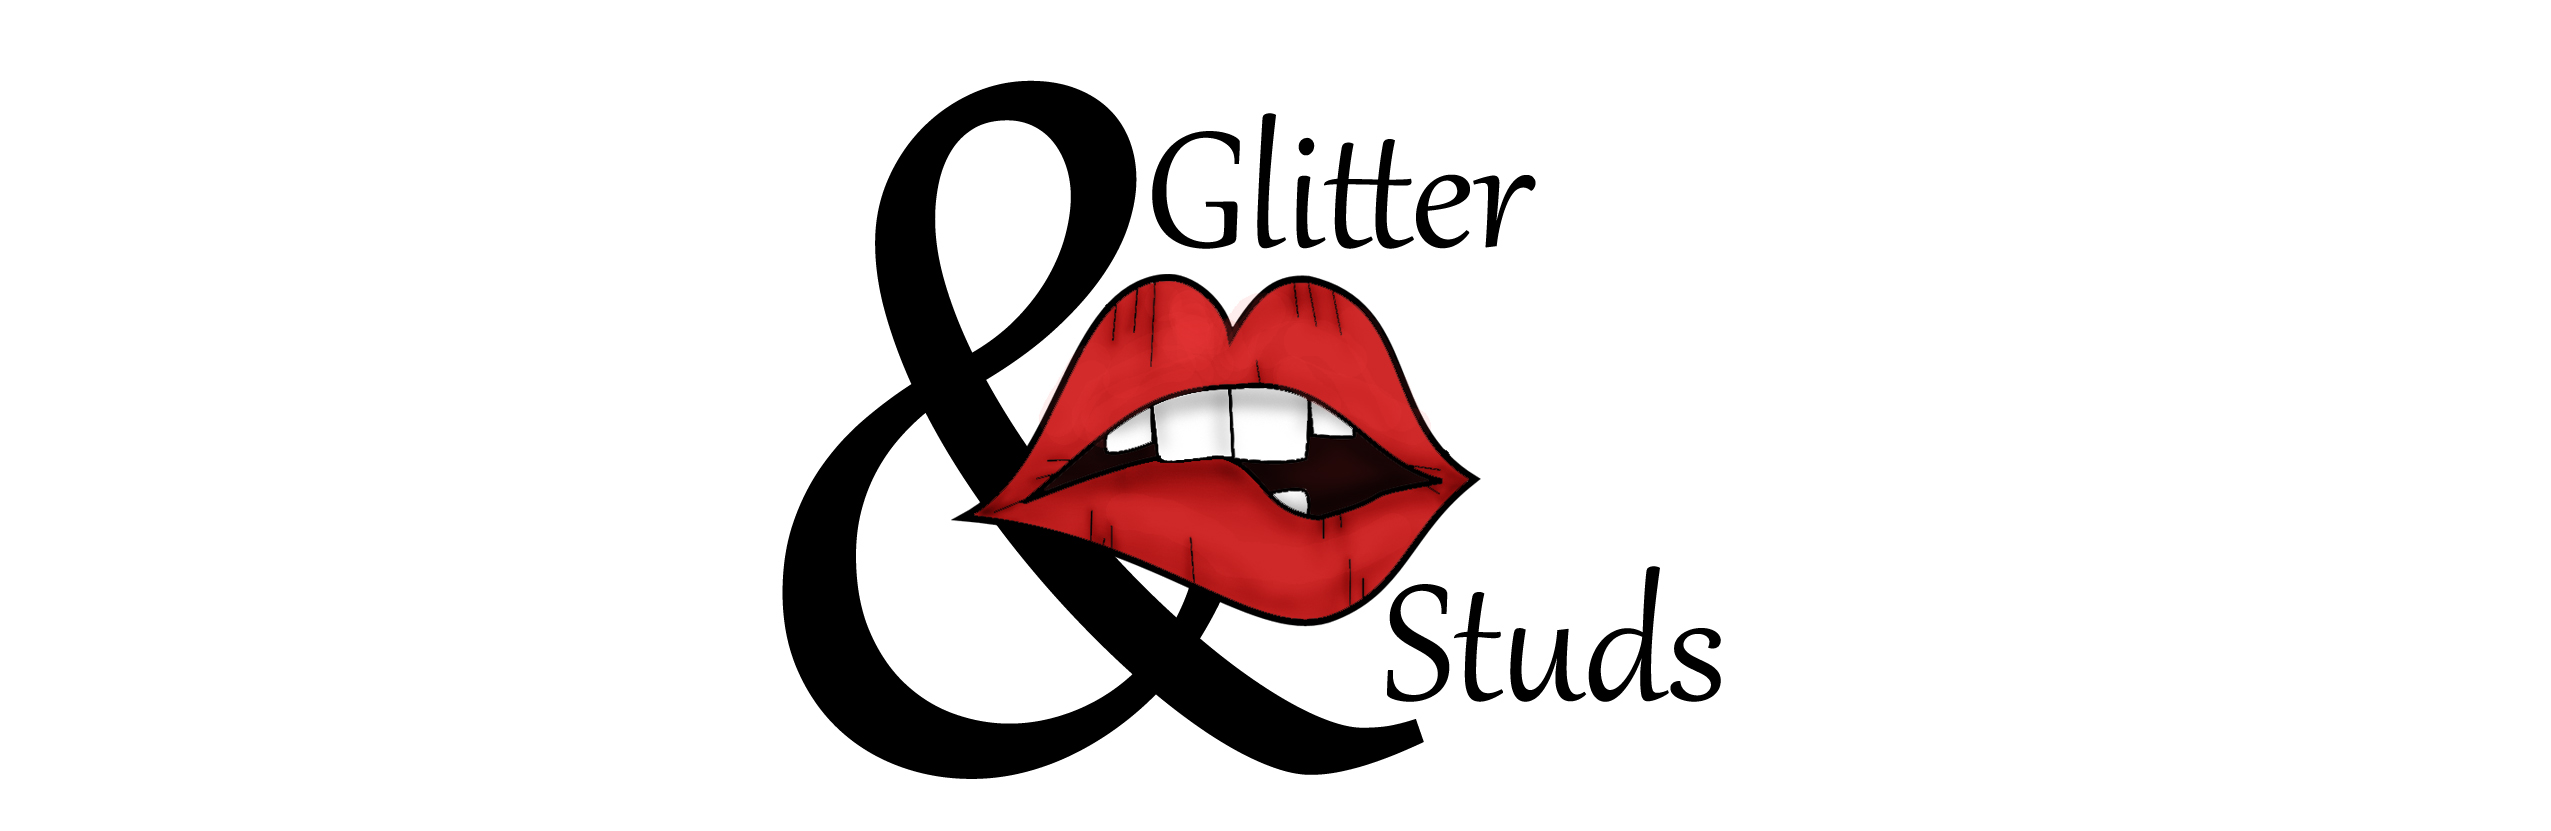 Glitter & studs